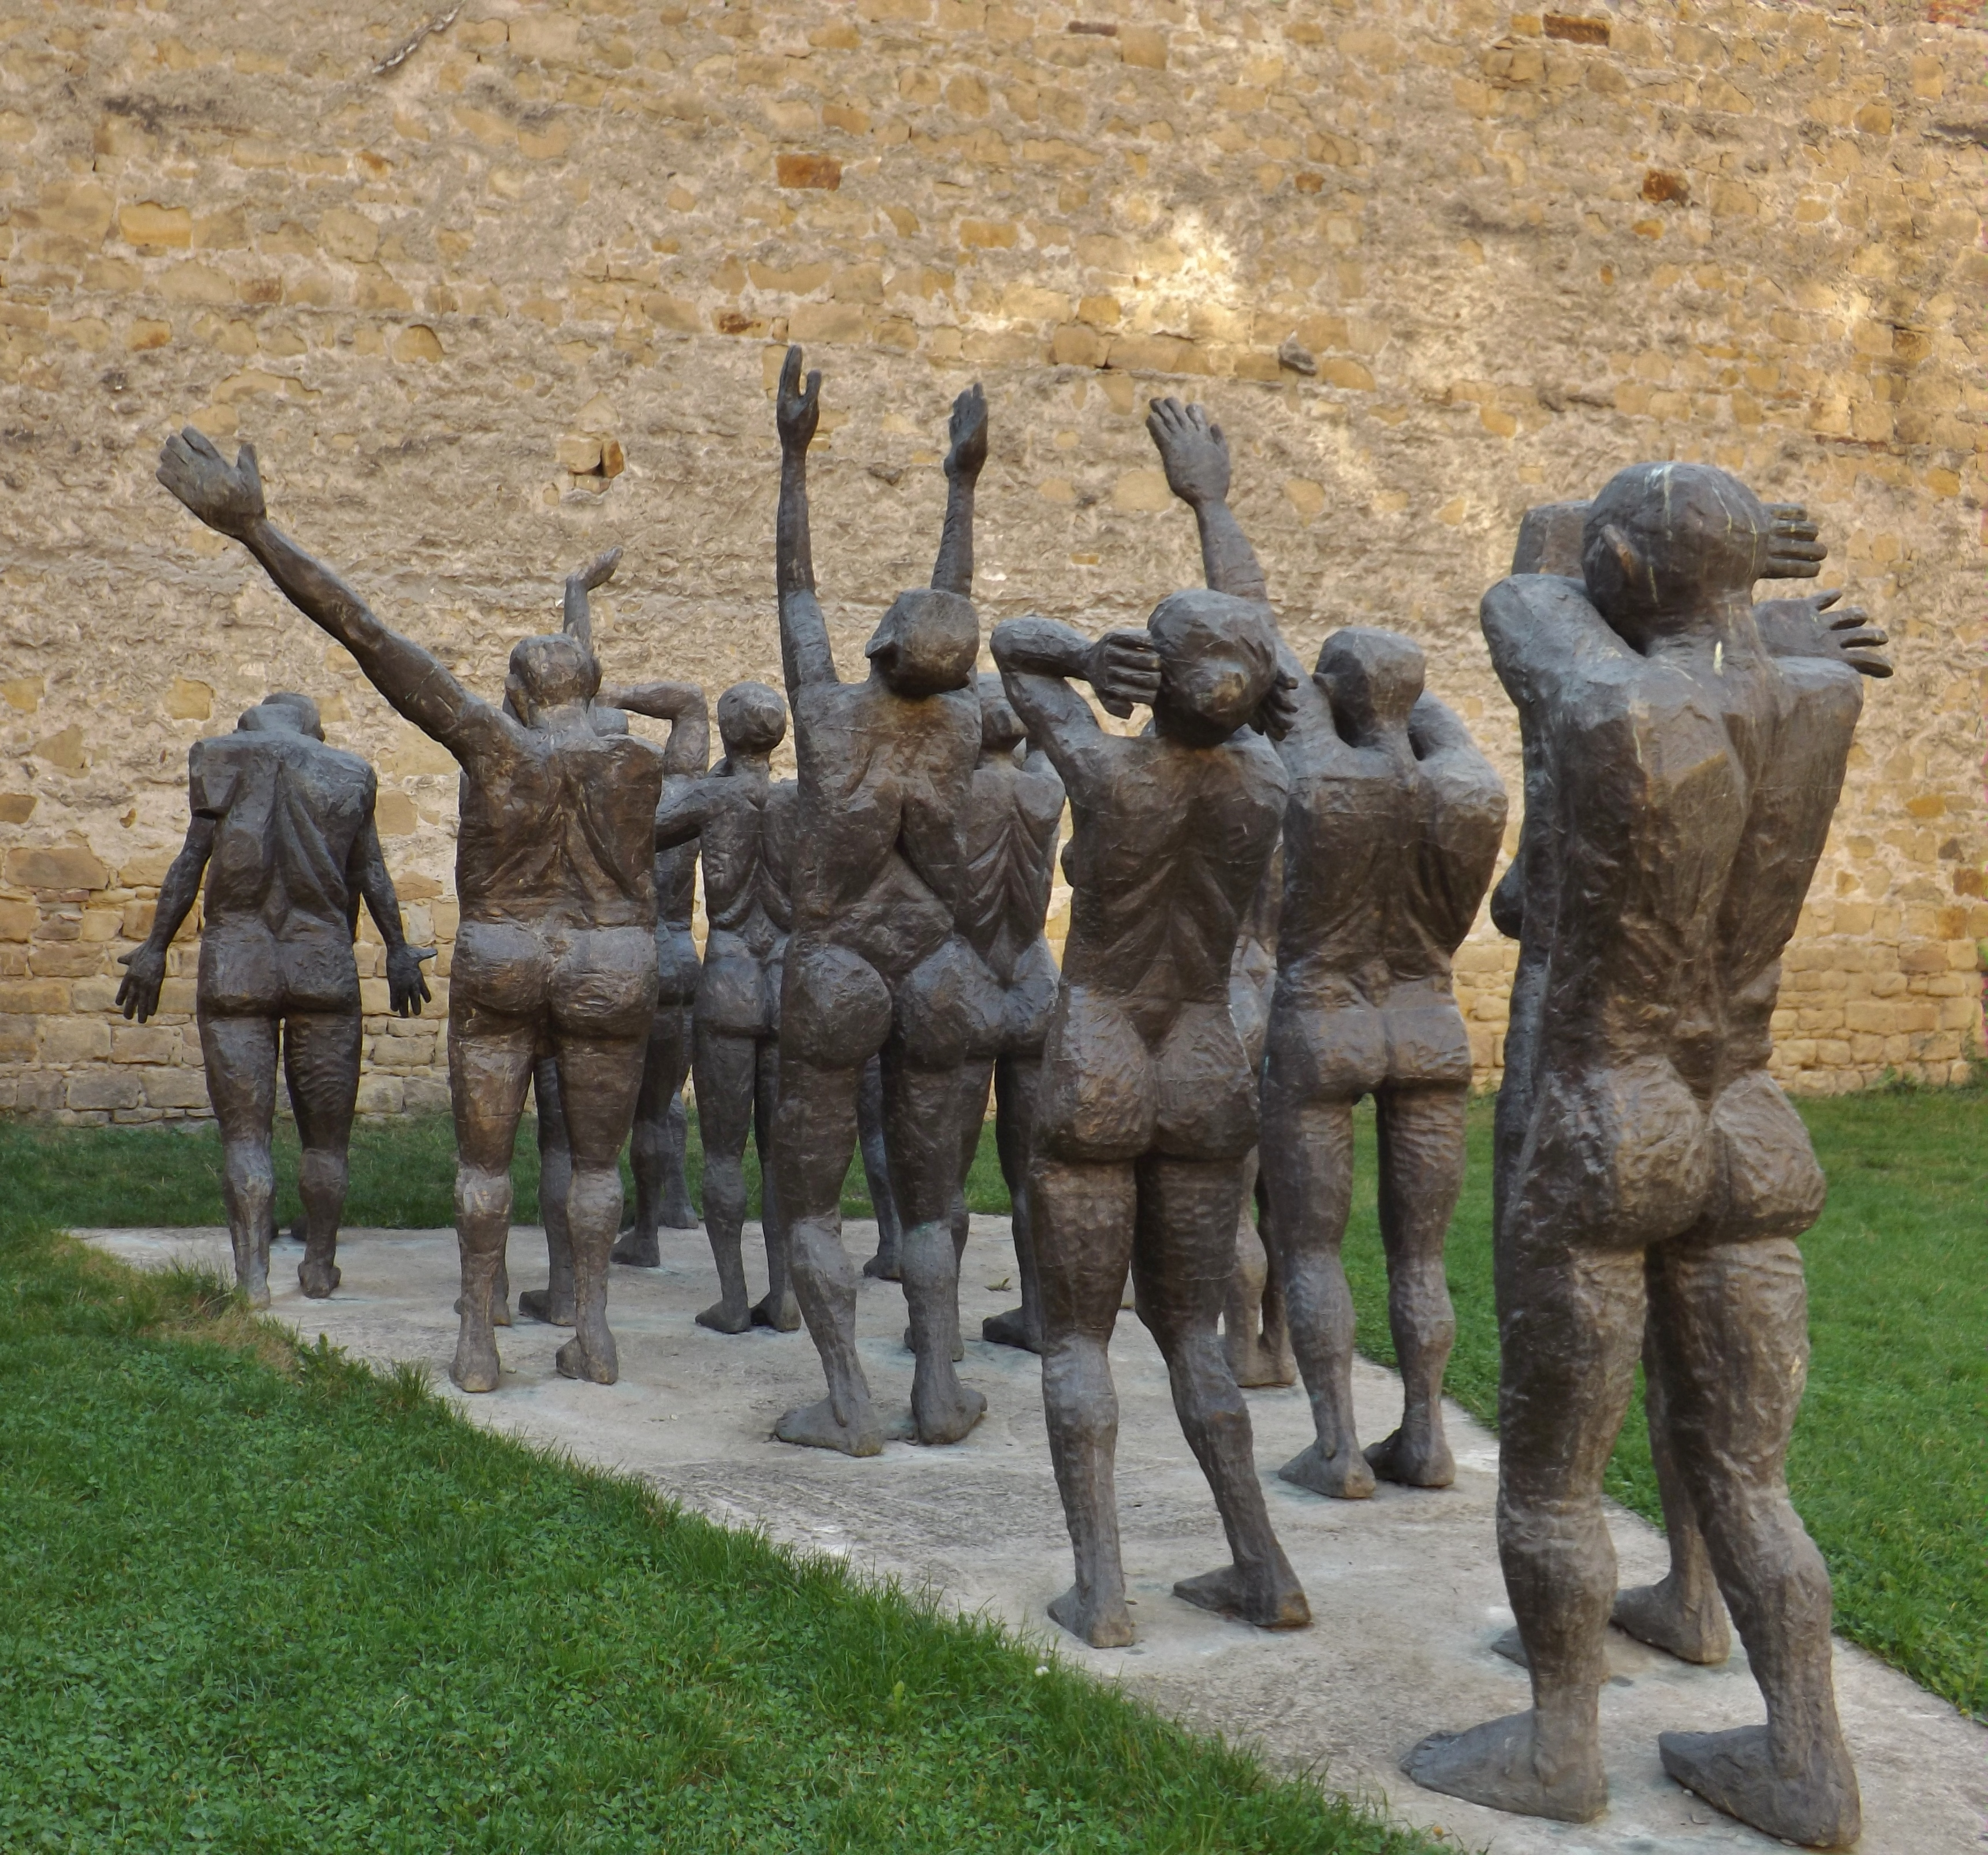 The Cortege of the Sacrificial Victims, statuary group by Aurel I. Vlad, Sighet